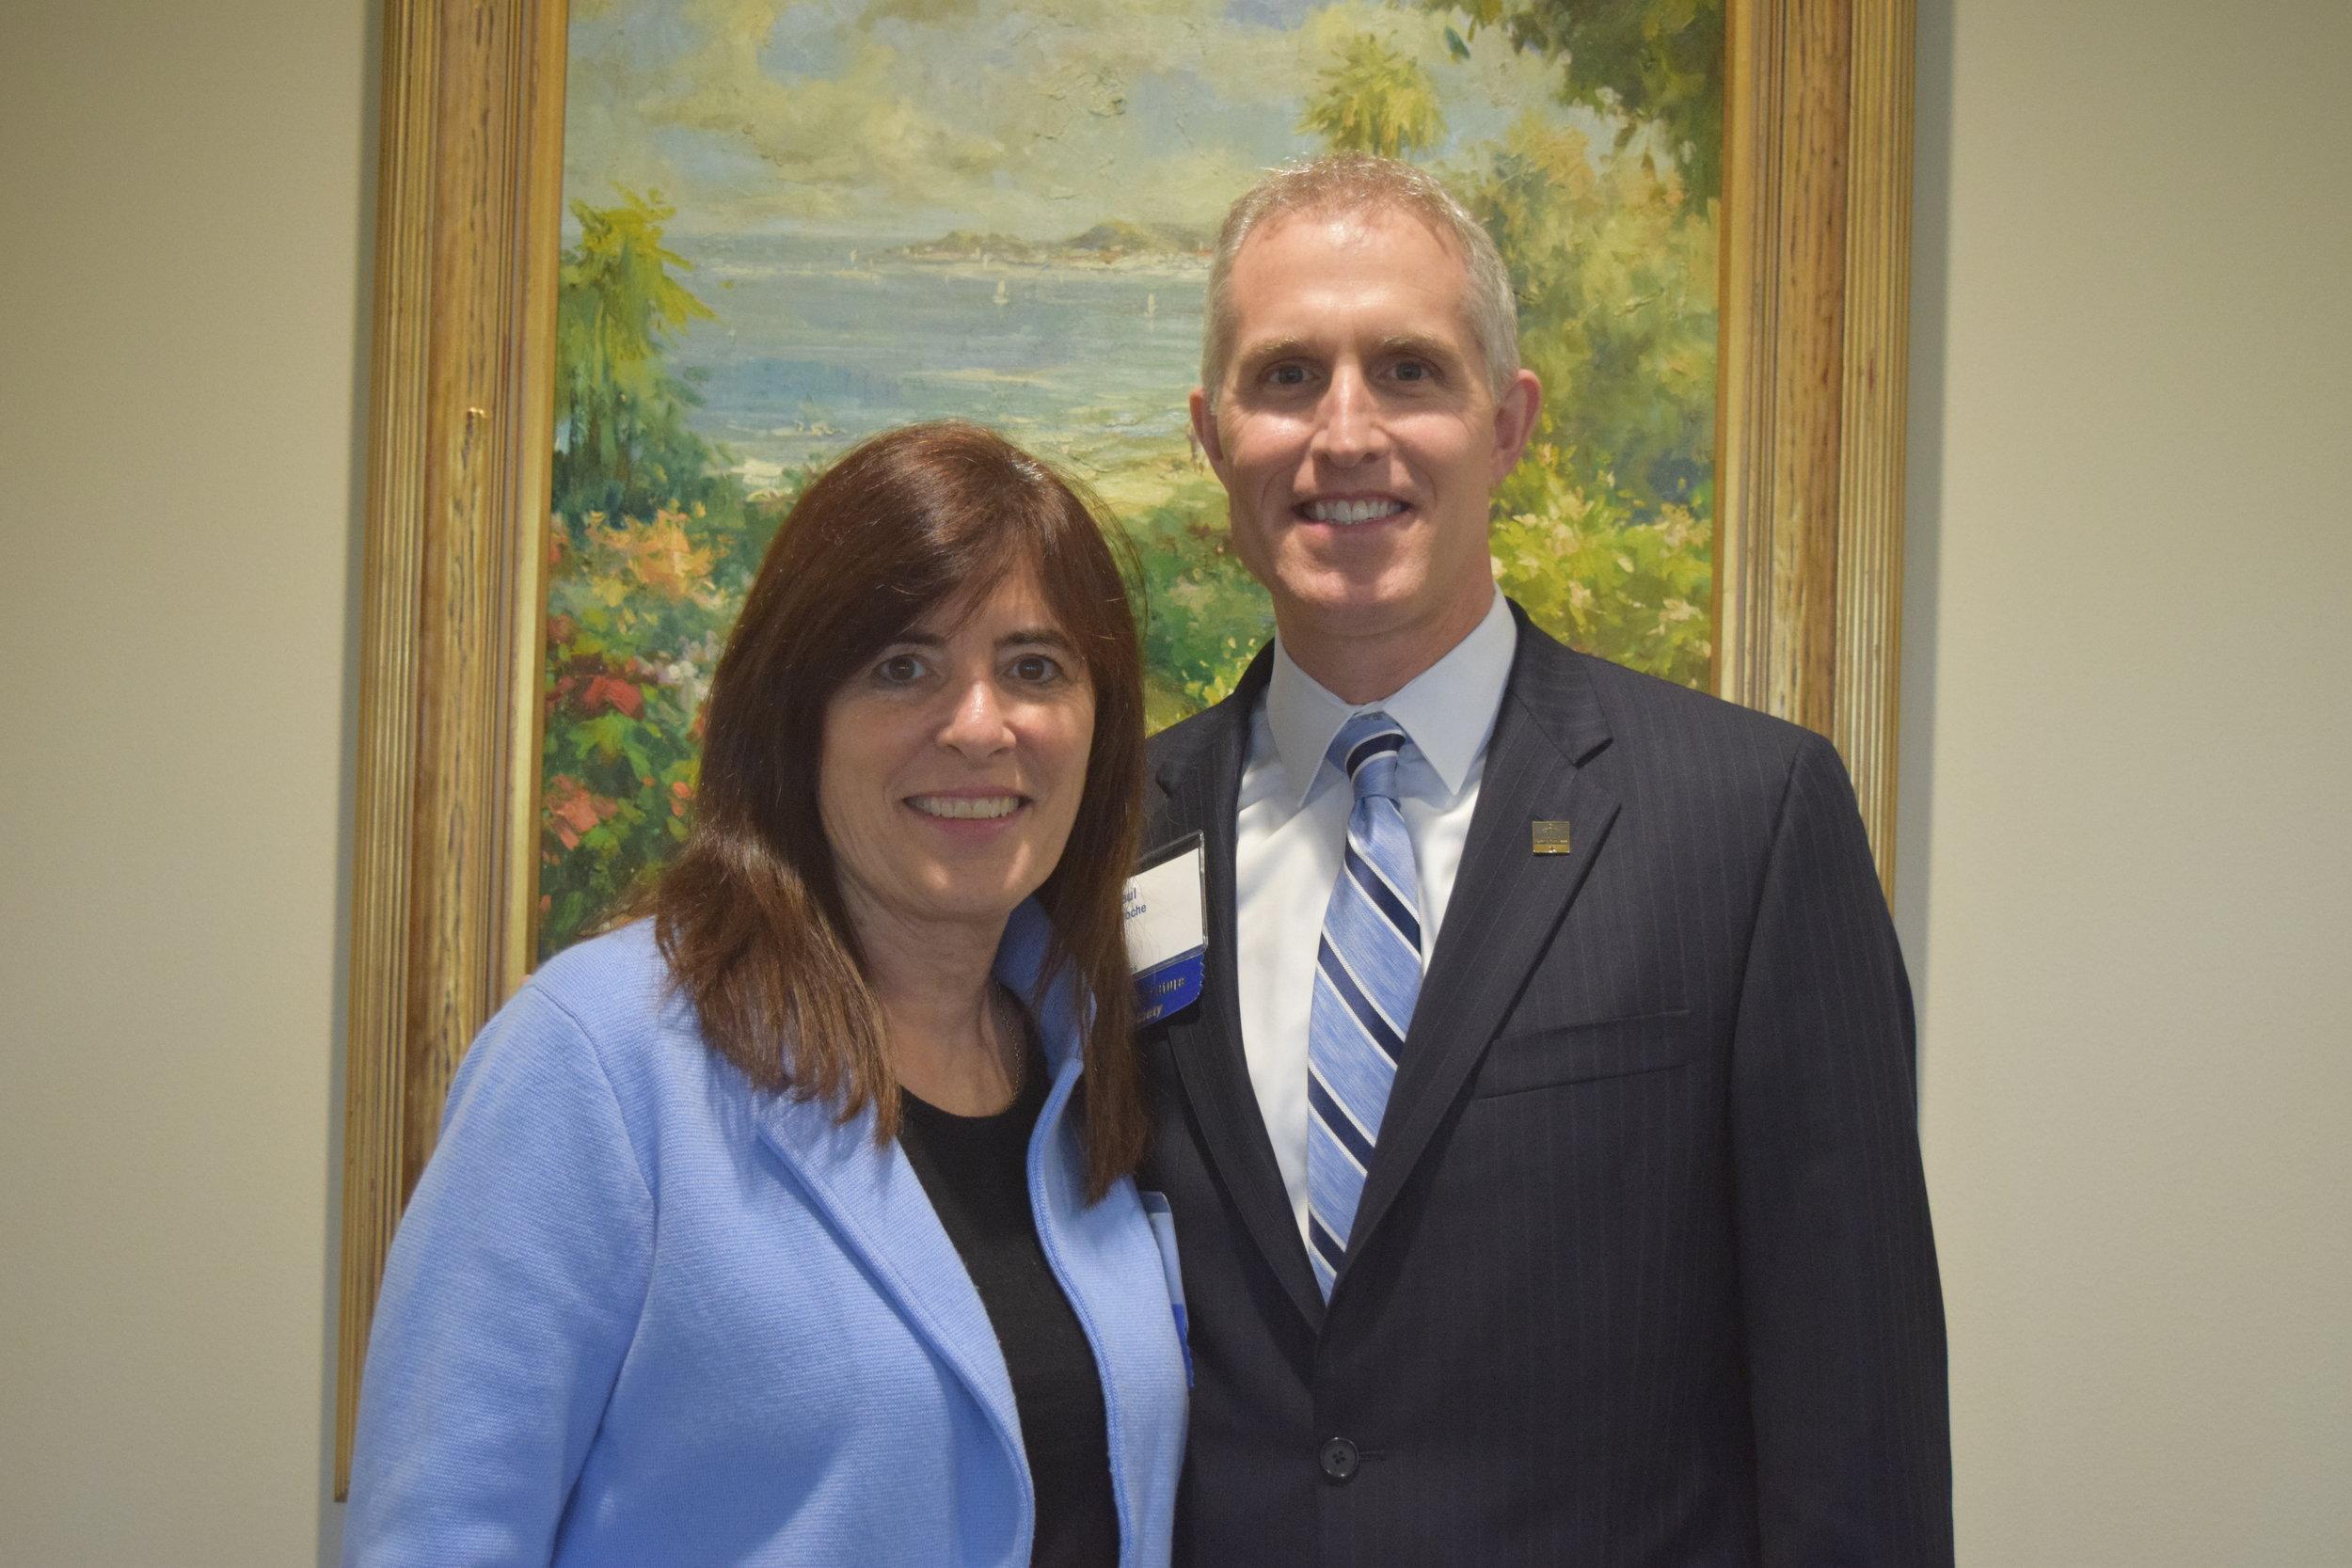 Board Chairman Betsy Meter with former Chairman Paul DeRoche.